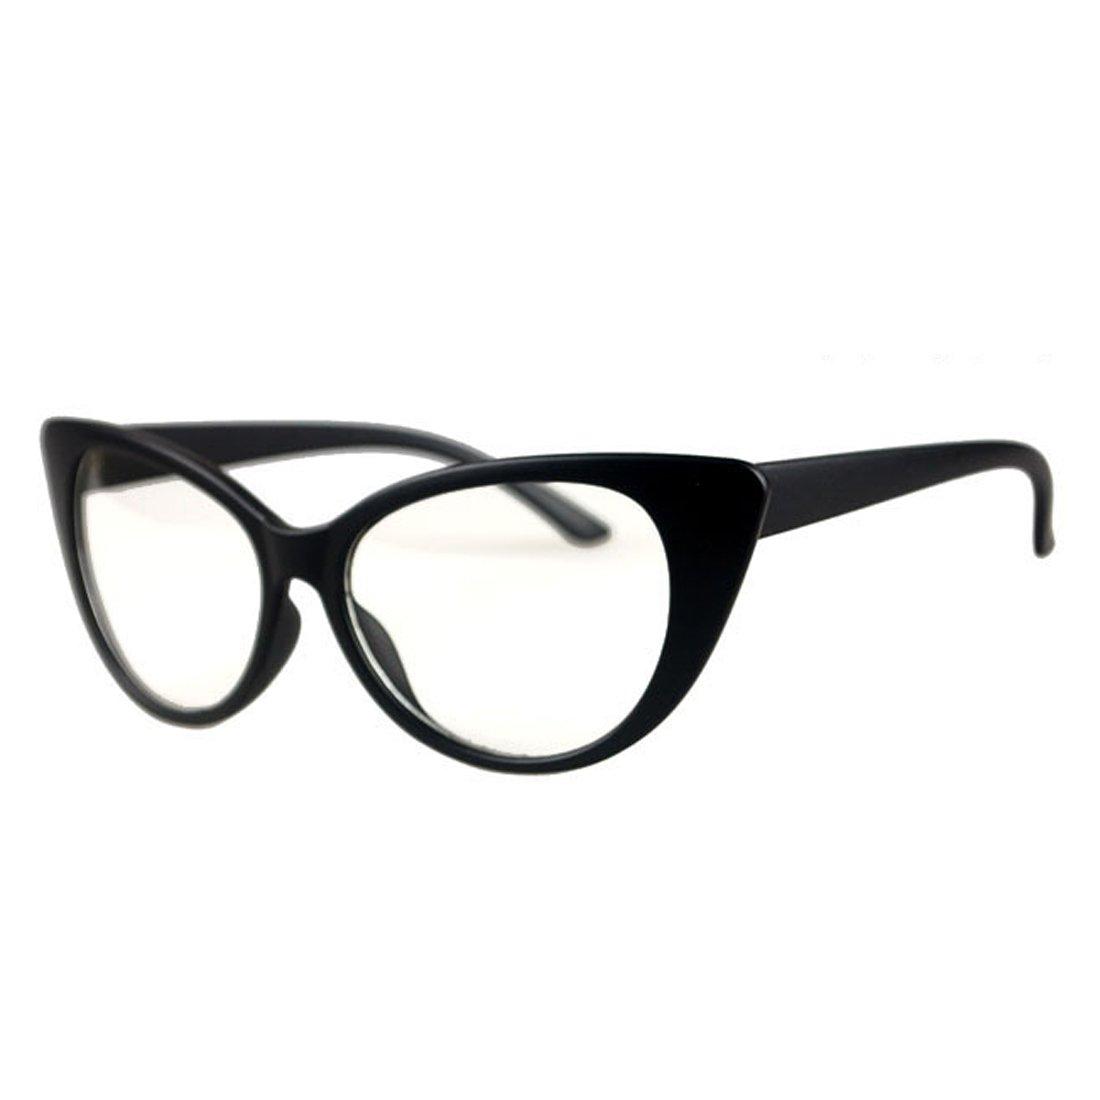 ebfc963ad1e3d NoyoKere Women Cat Eye Glasses Frames Striped Retro Eyeglasses Ladies  Vintage Plain Spectacles Frame Clear Lens Glasses  Amazon.co.uk  Sports    Outdoors